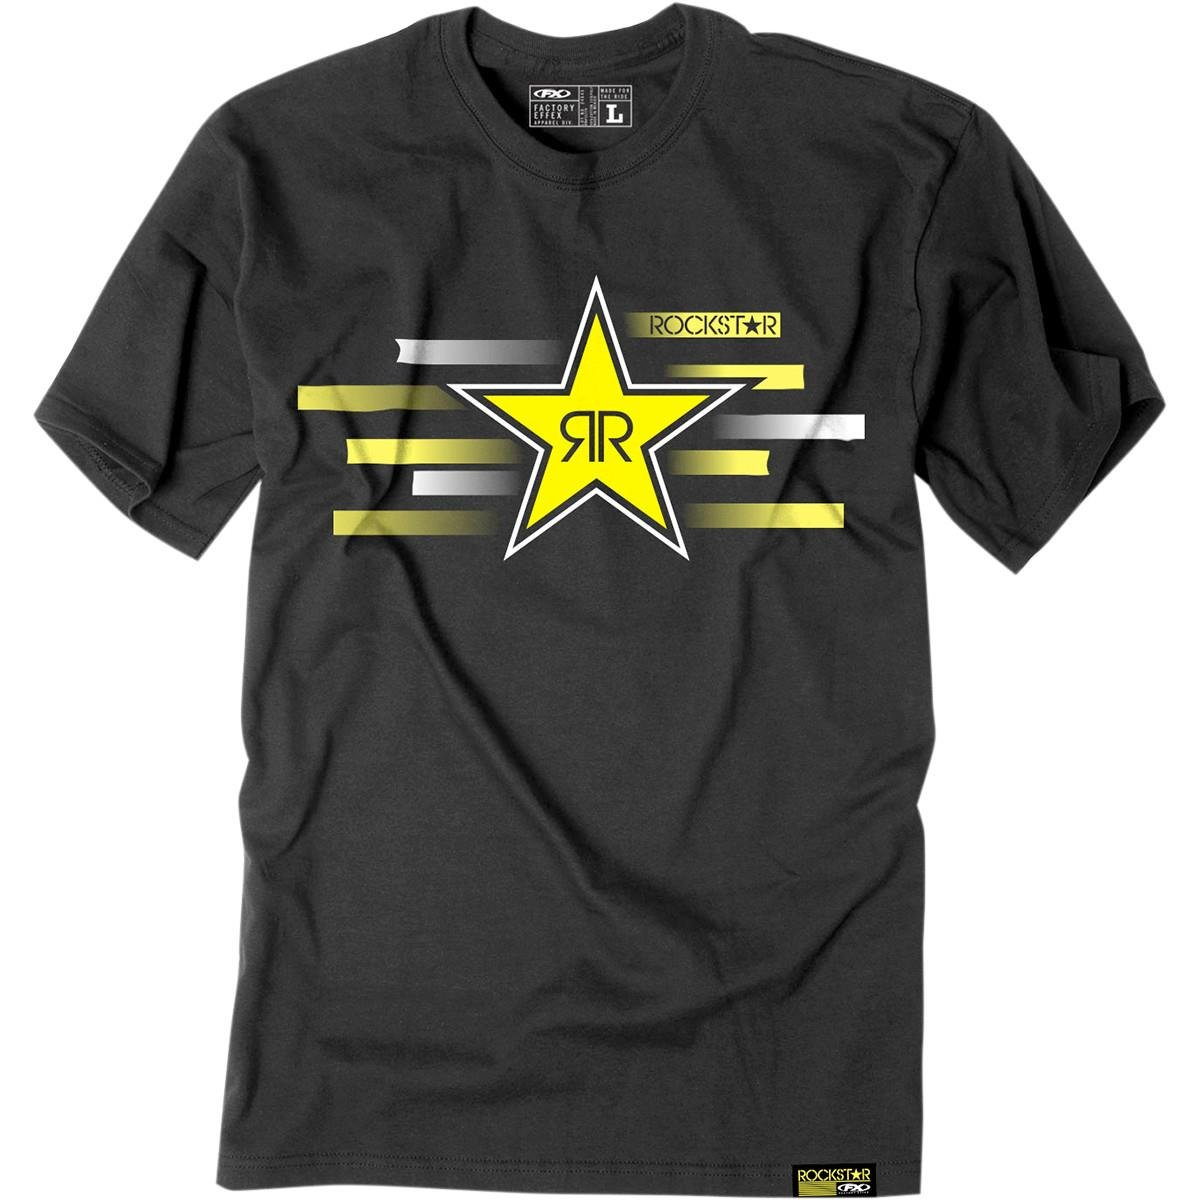 Black, Medium Factory Effex Rockstar T-Shirt 18-87602